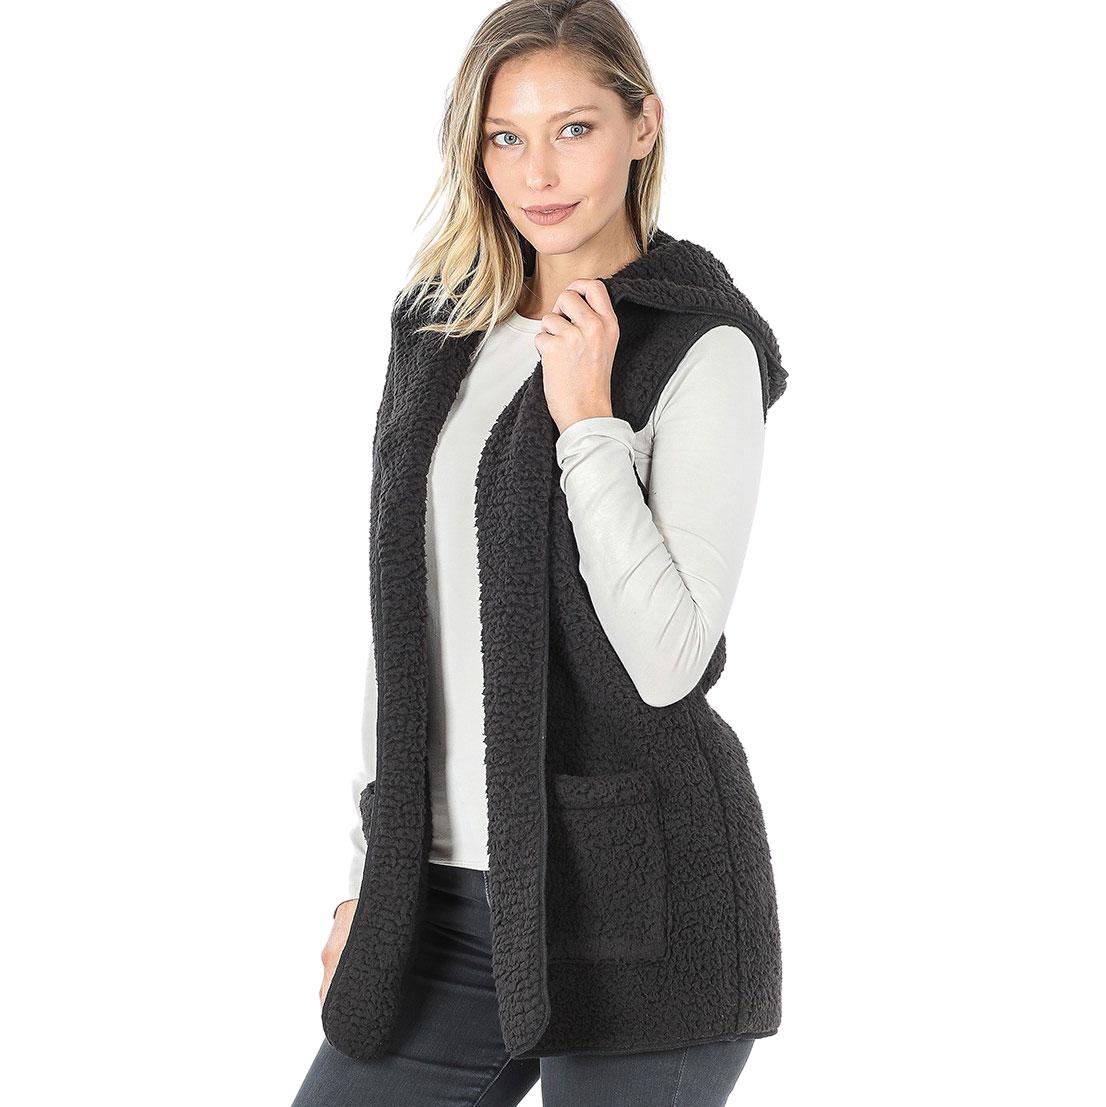 Vest - Sherpa Hooded Vest 75021